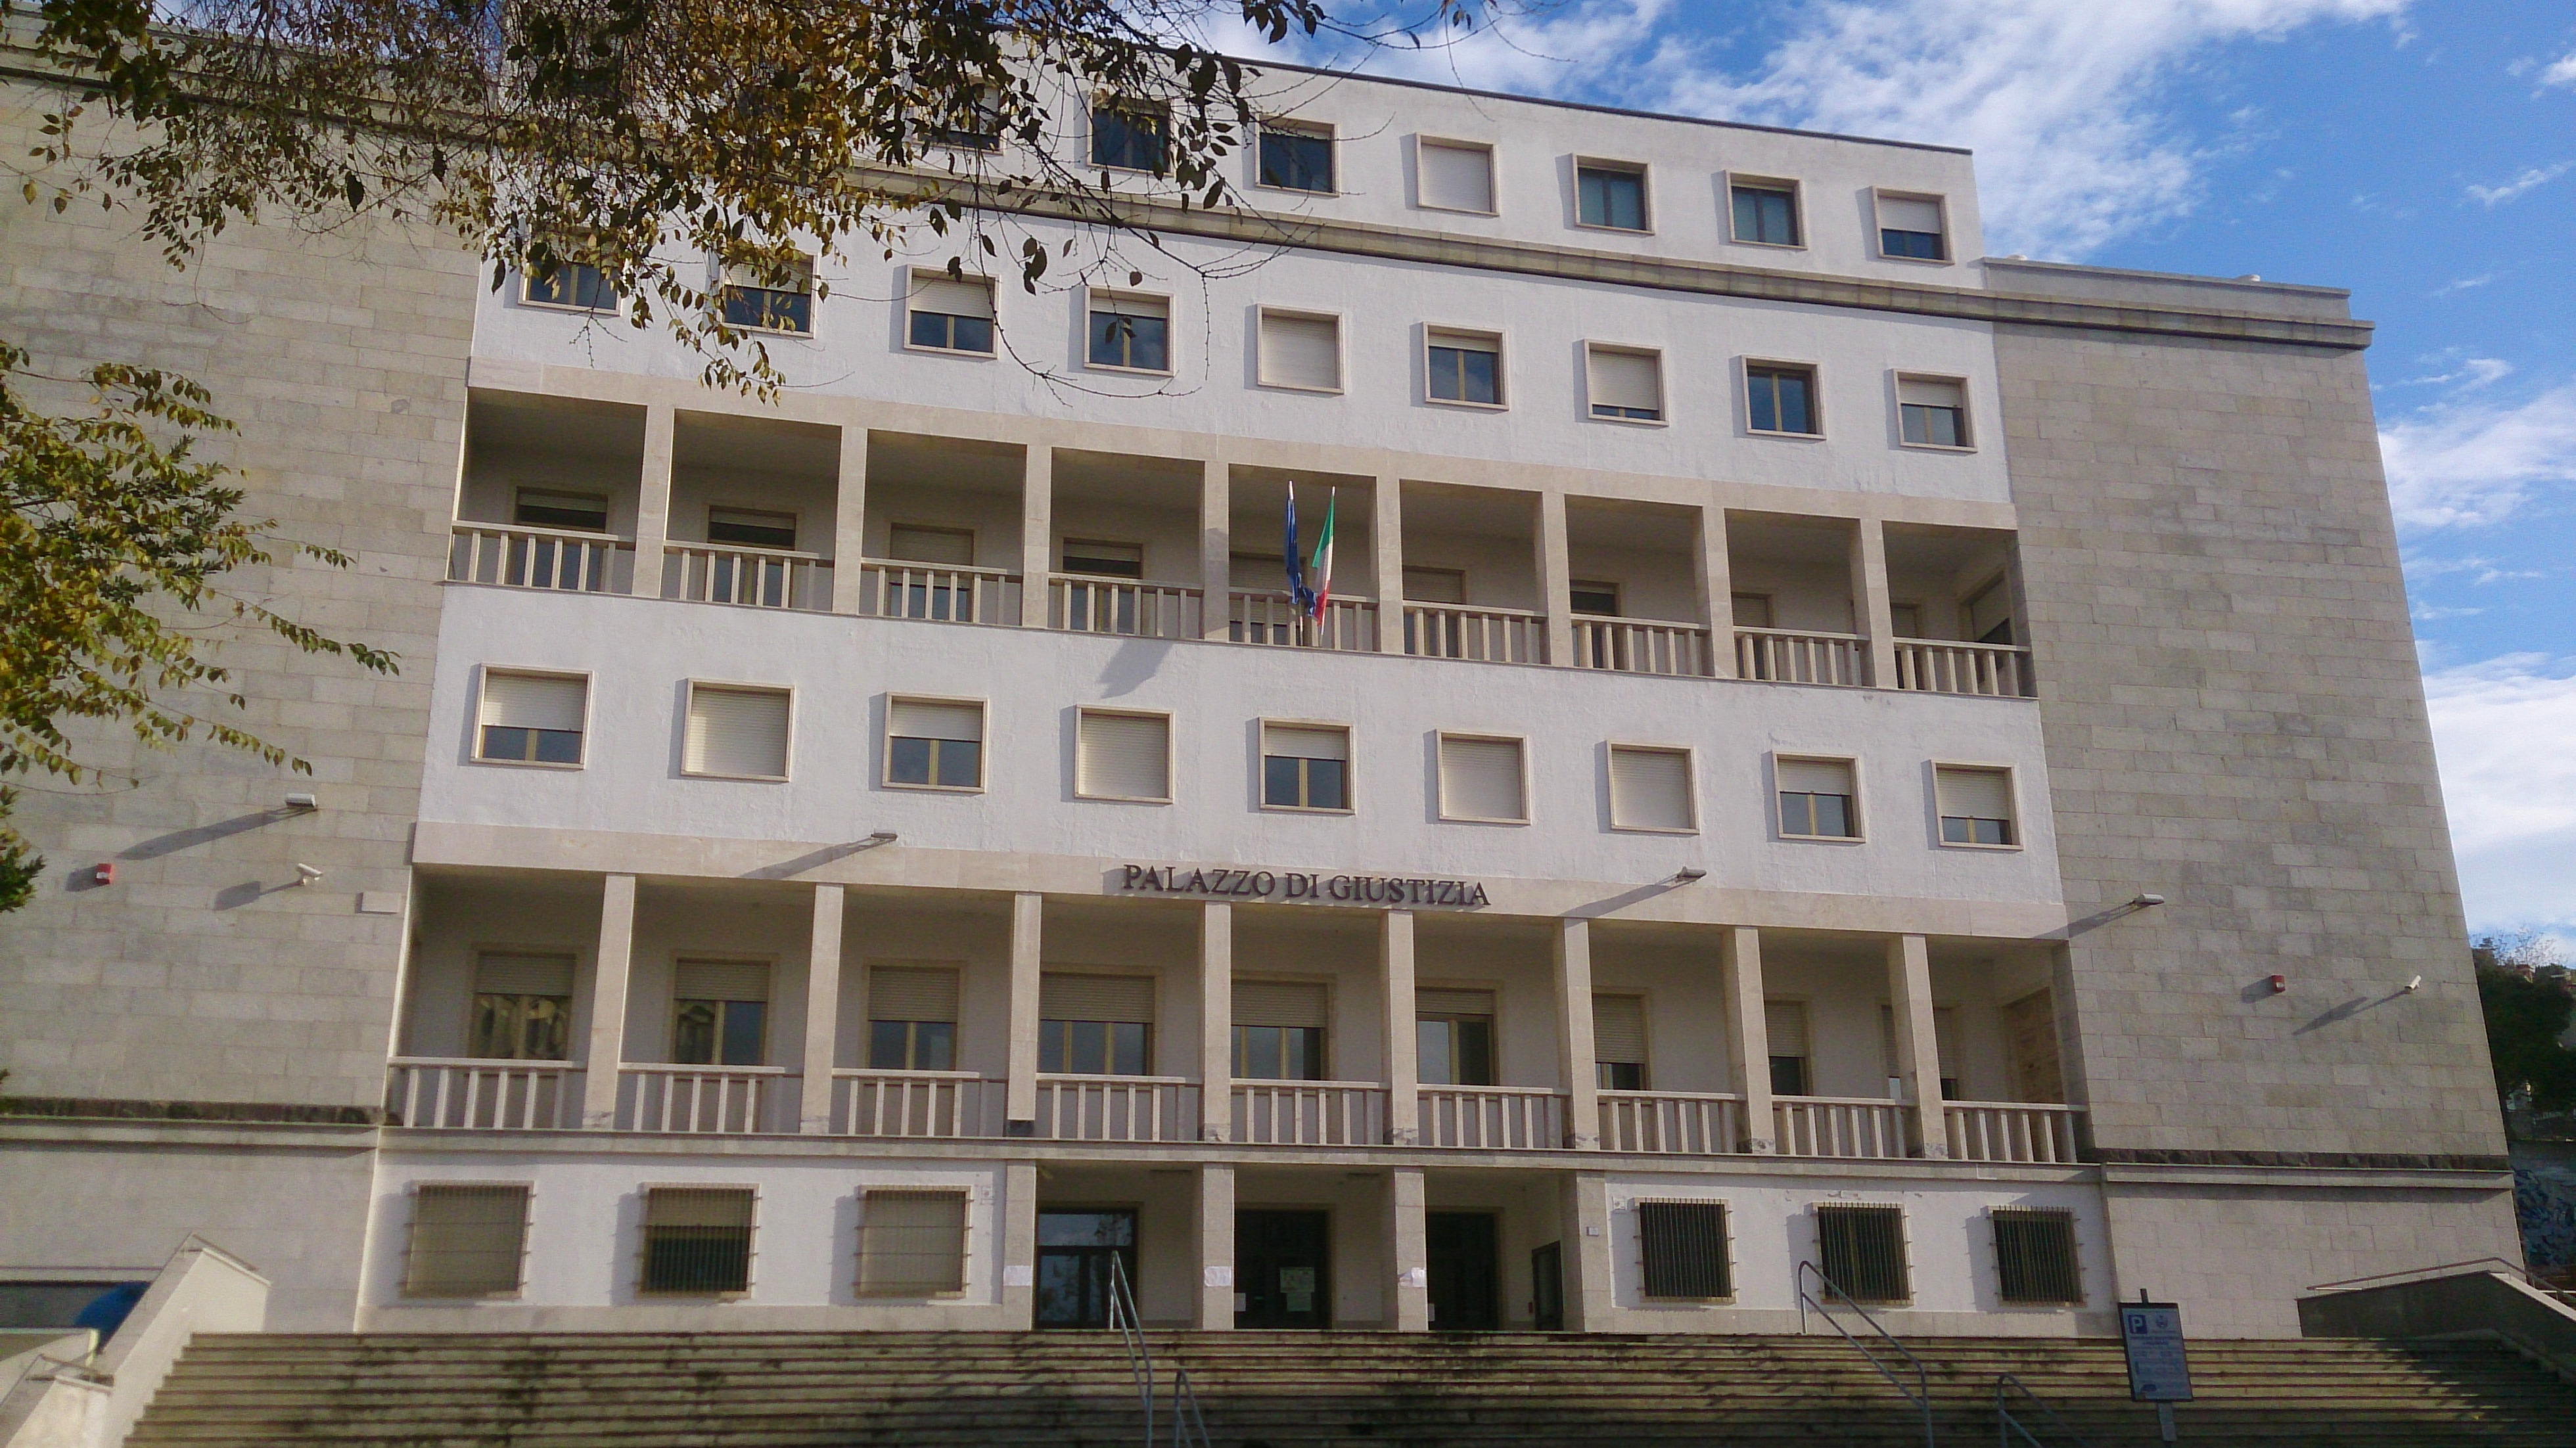 SFO - Scuola Forense Nuoro